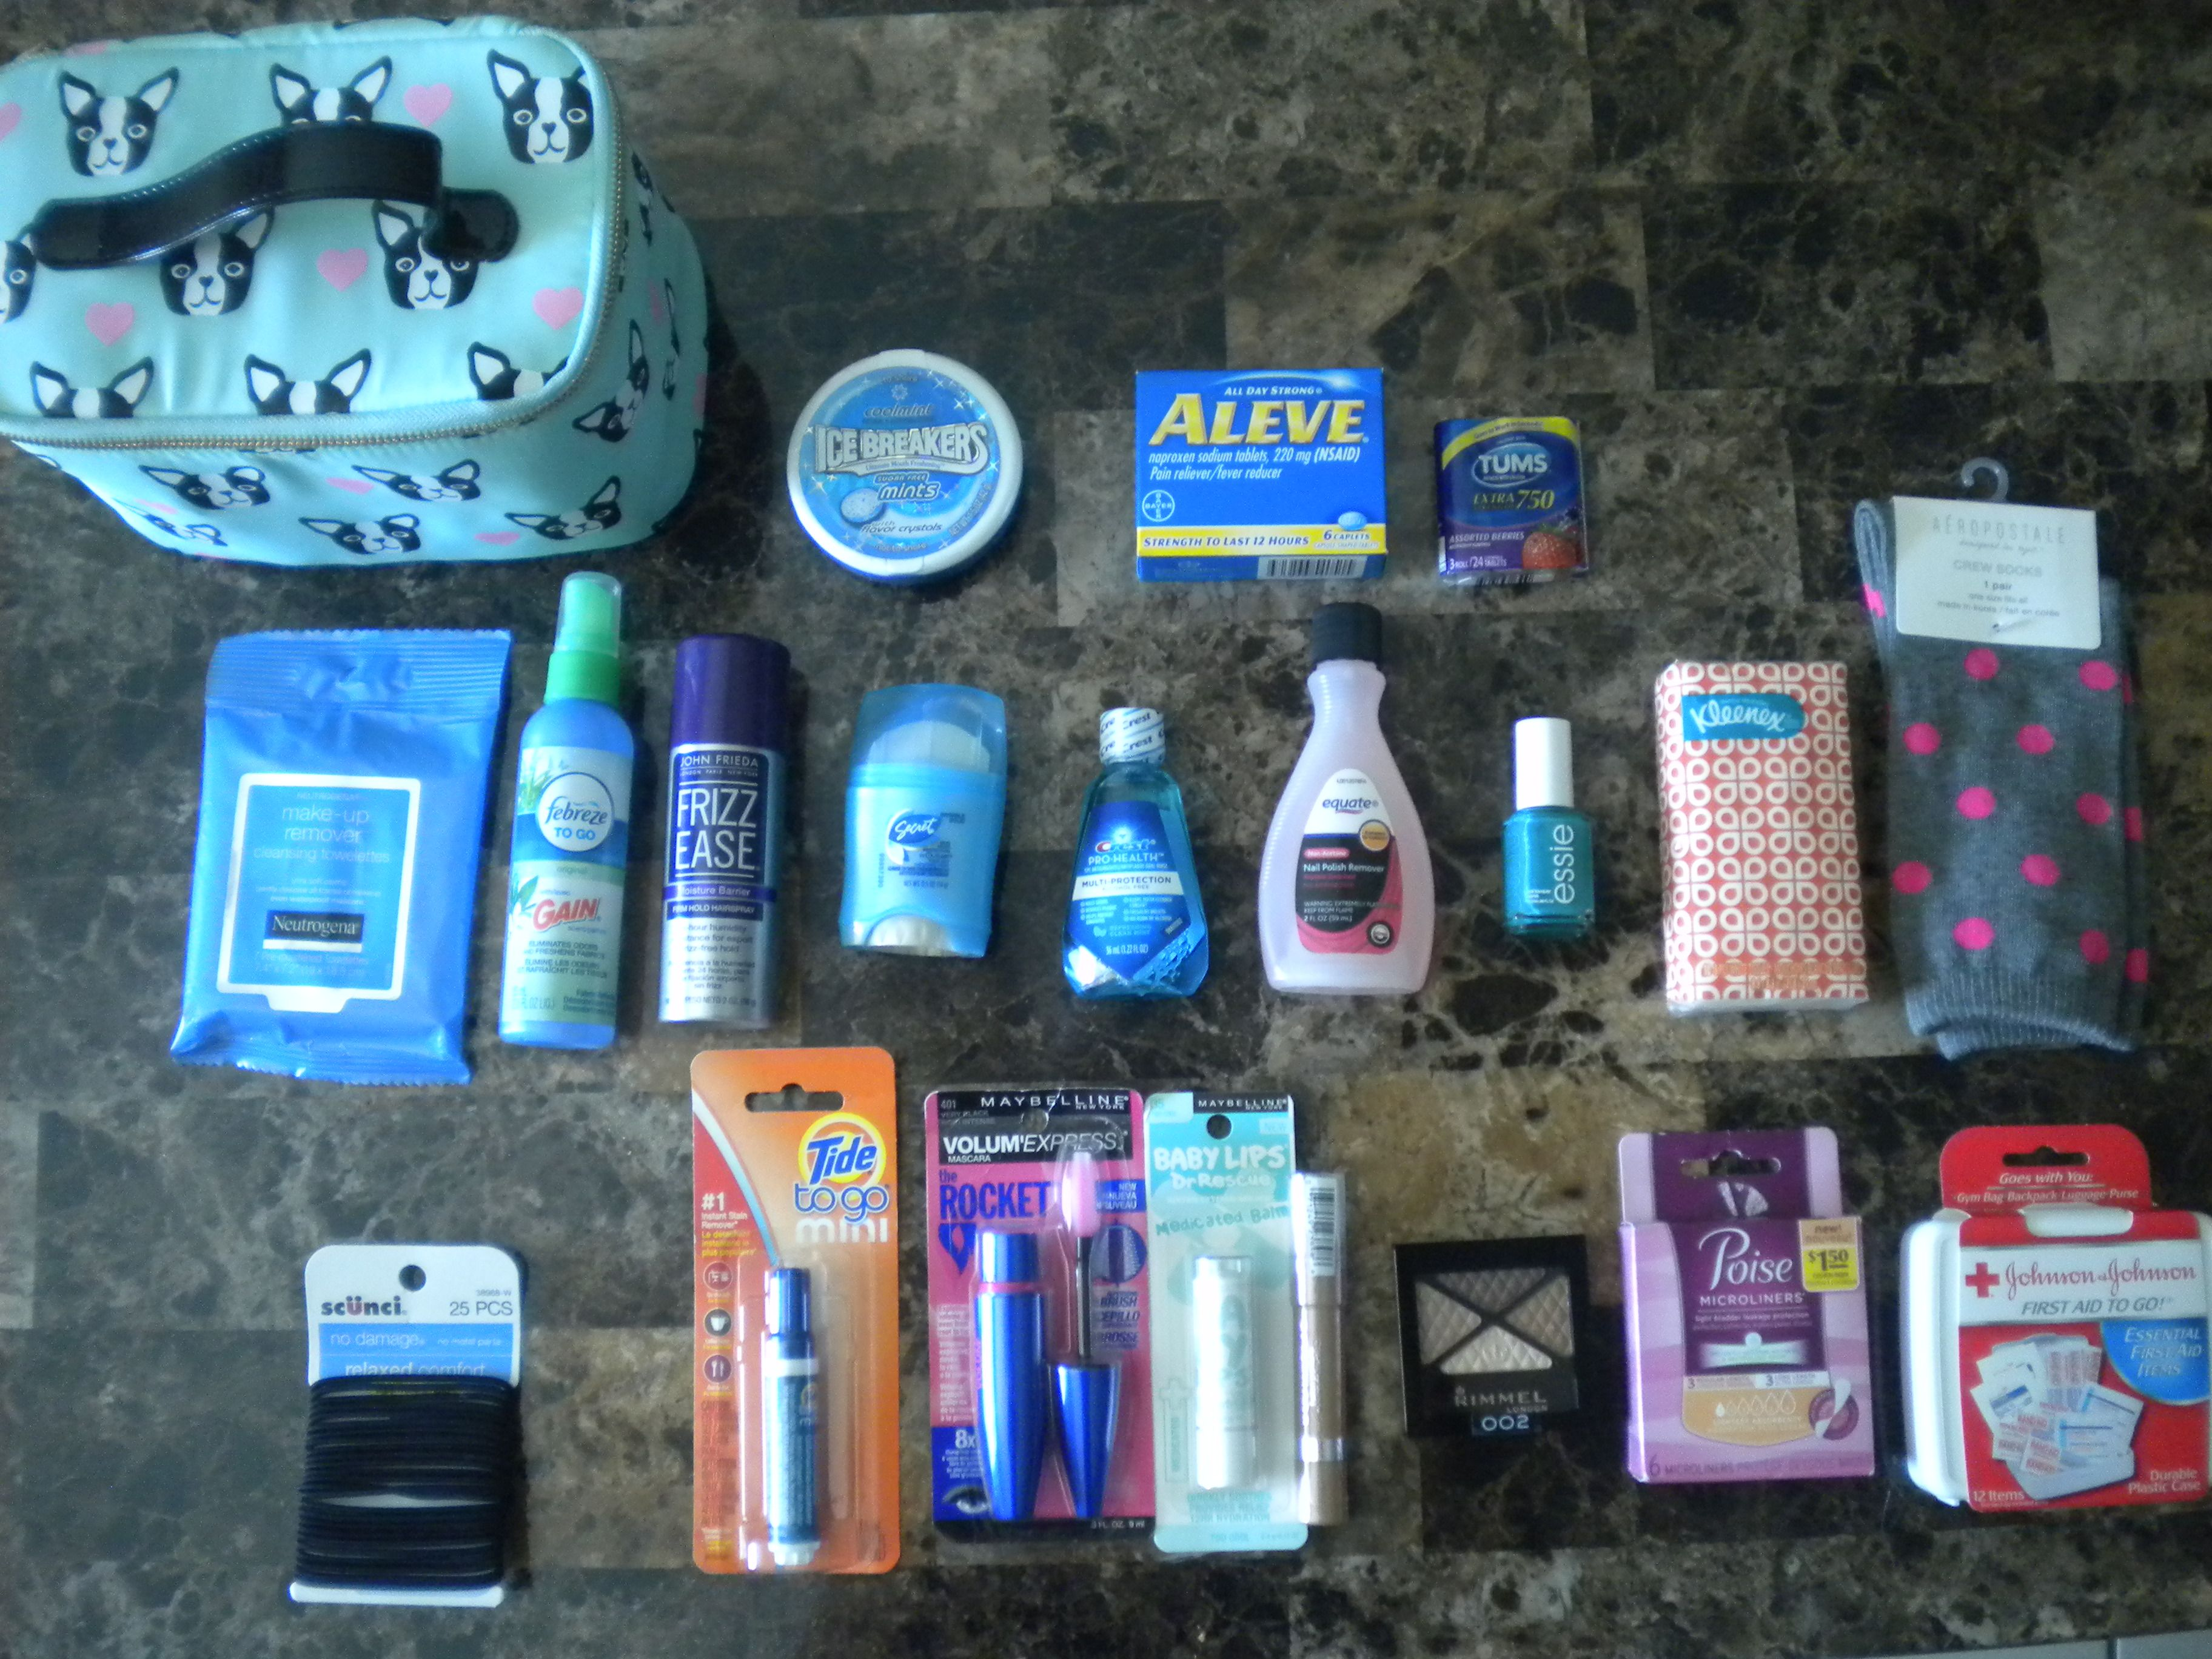 18th Birthday Car Emergency Kit Teenage Girl. 18th Birthday Car Emergency Kit Teenage Girl   Survival Kits